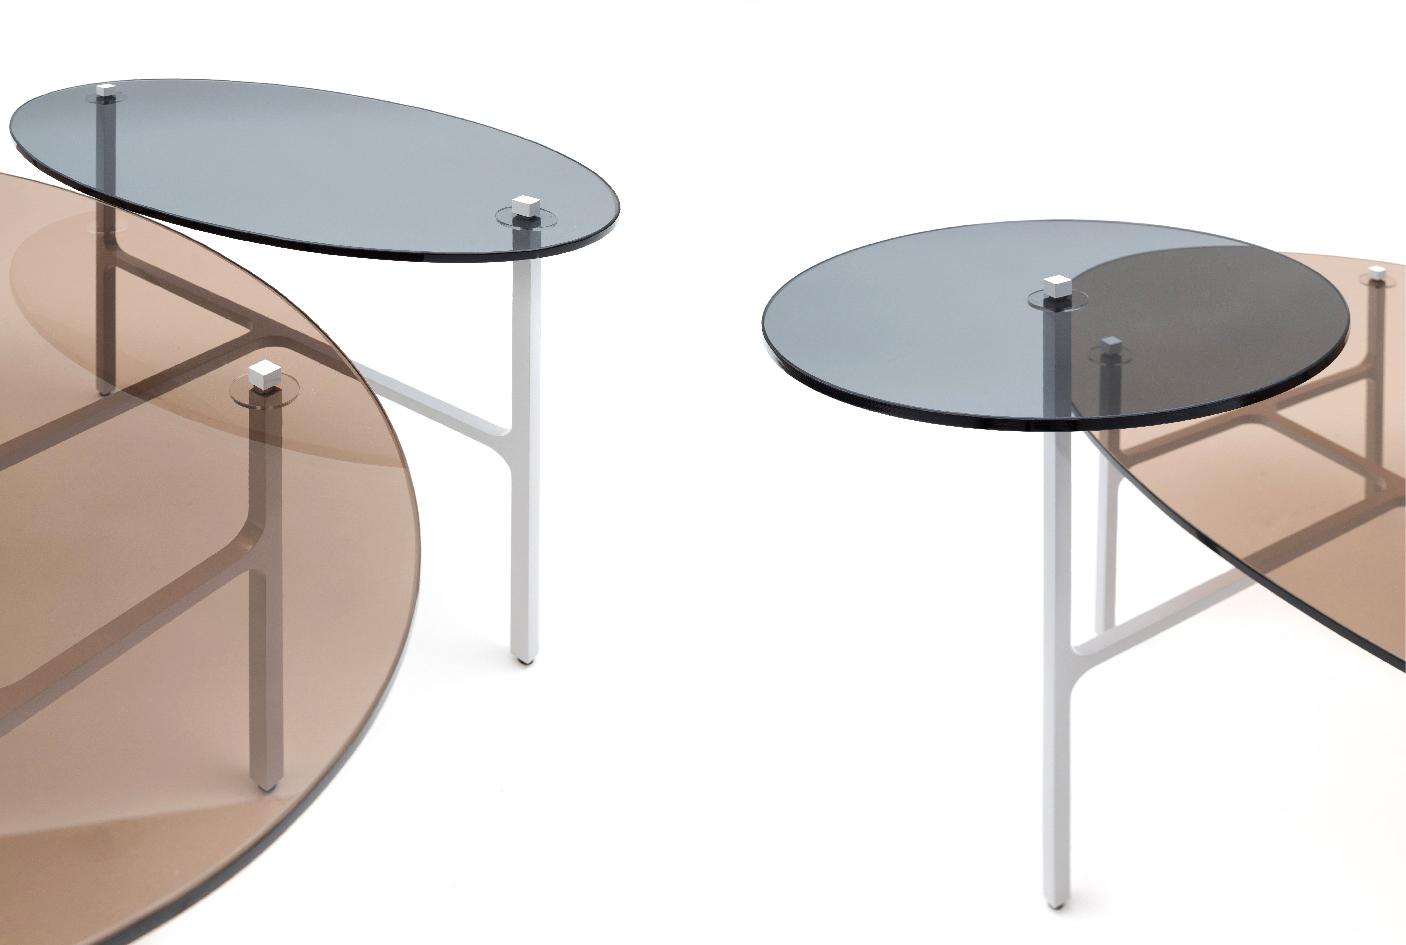 Luna Nesting Table_Comp3-01.jpg